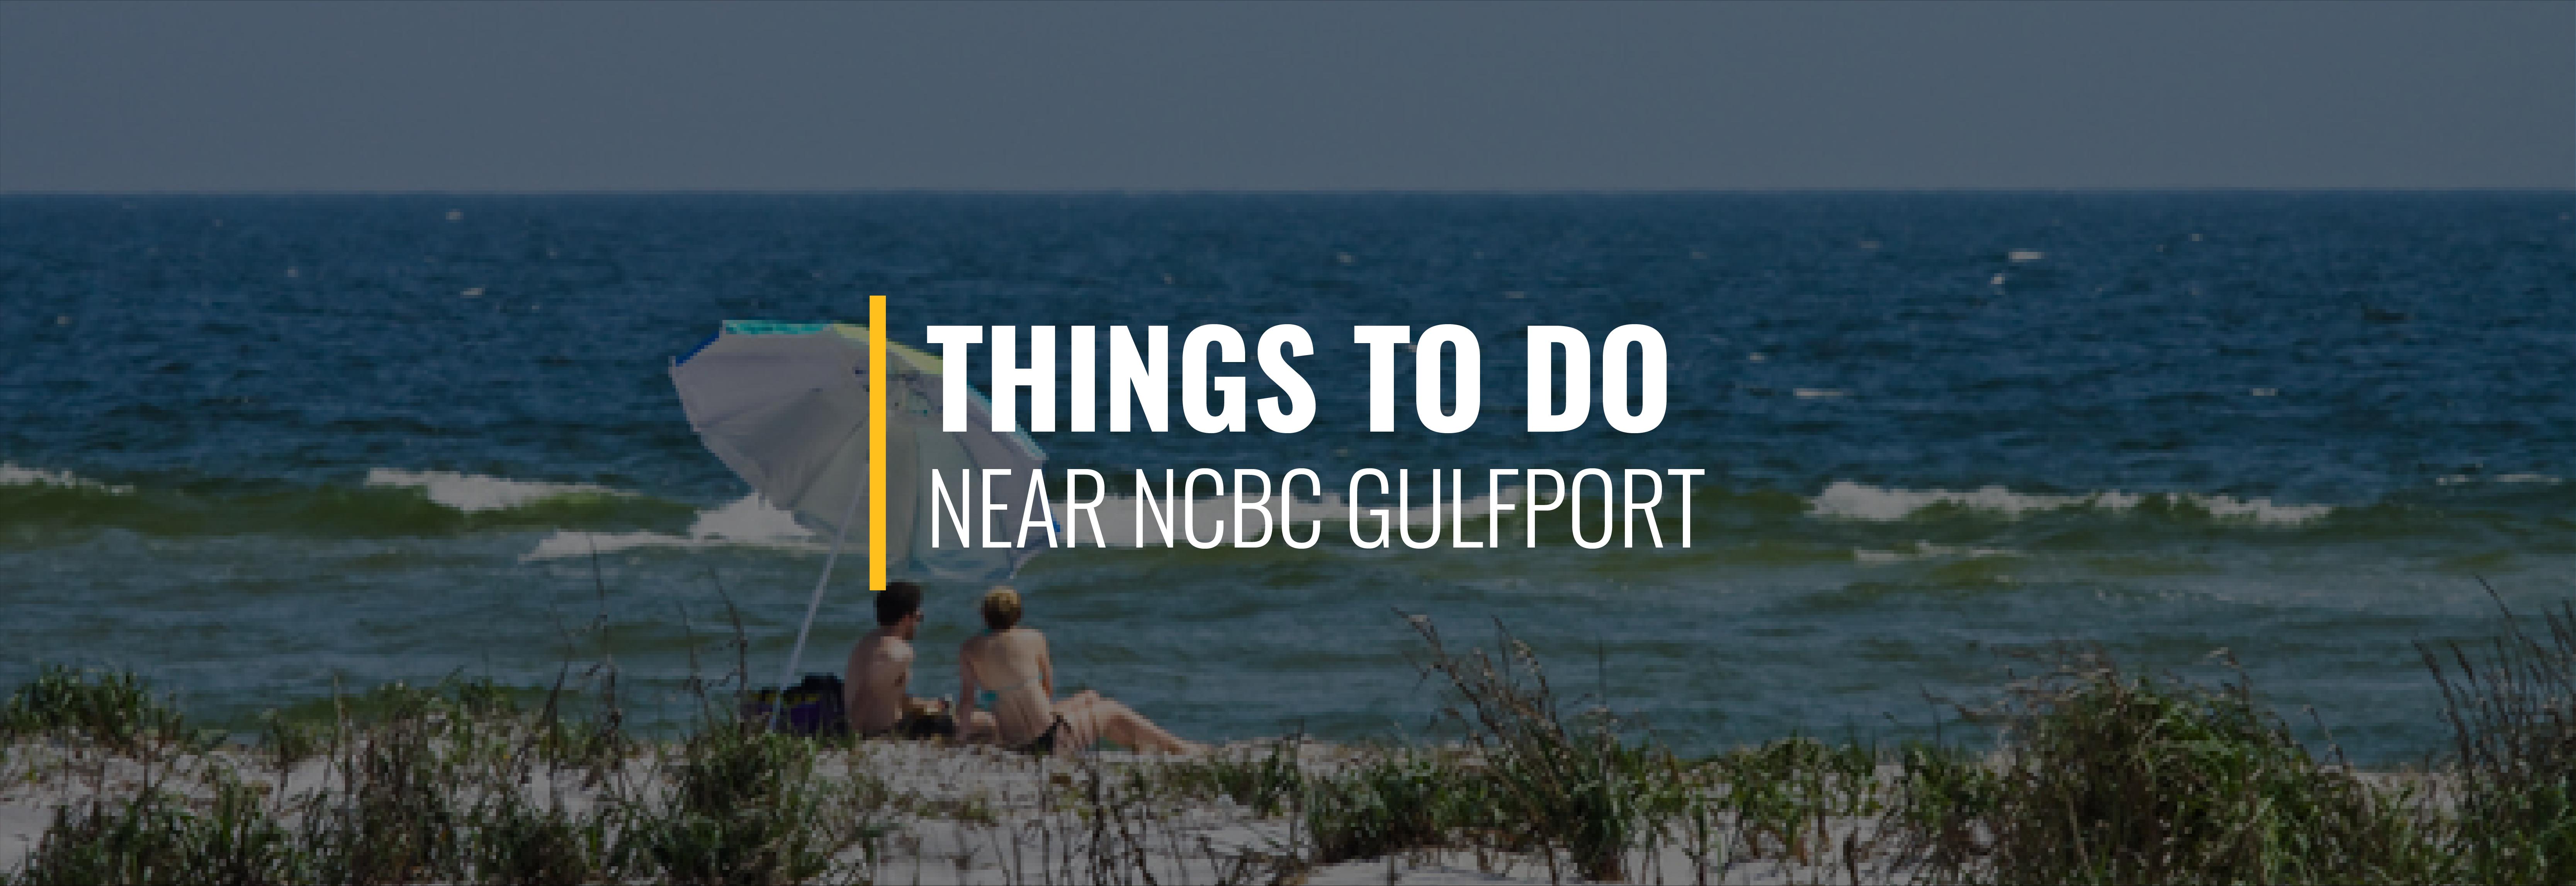 NCBC Gulfport Things to Do